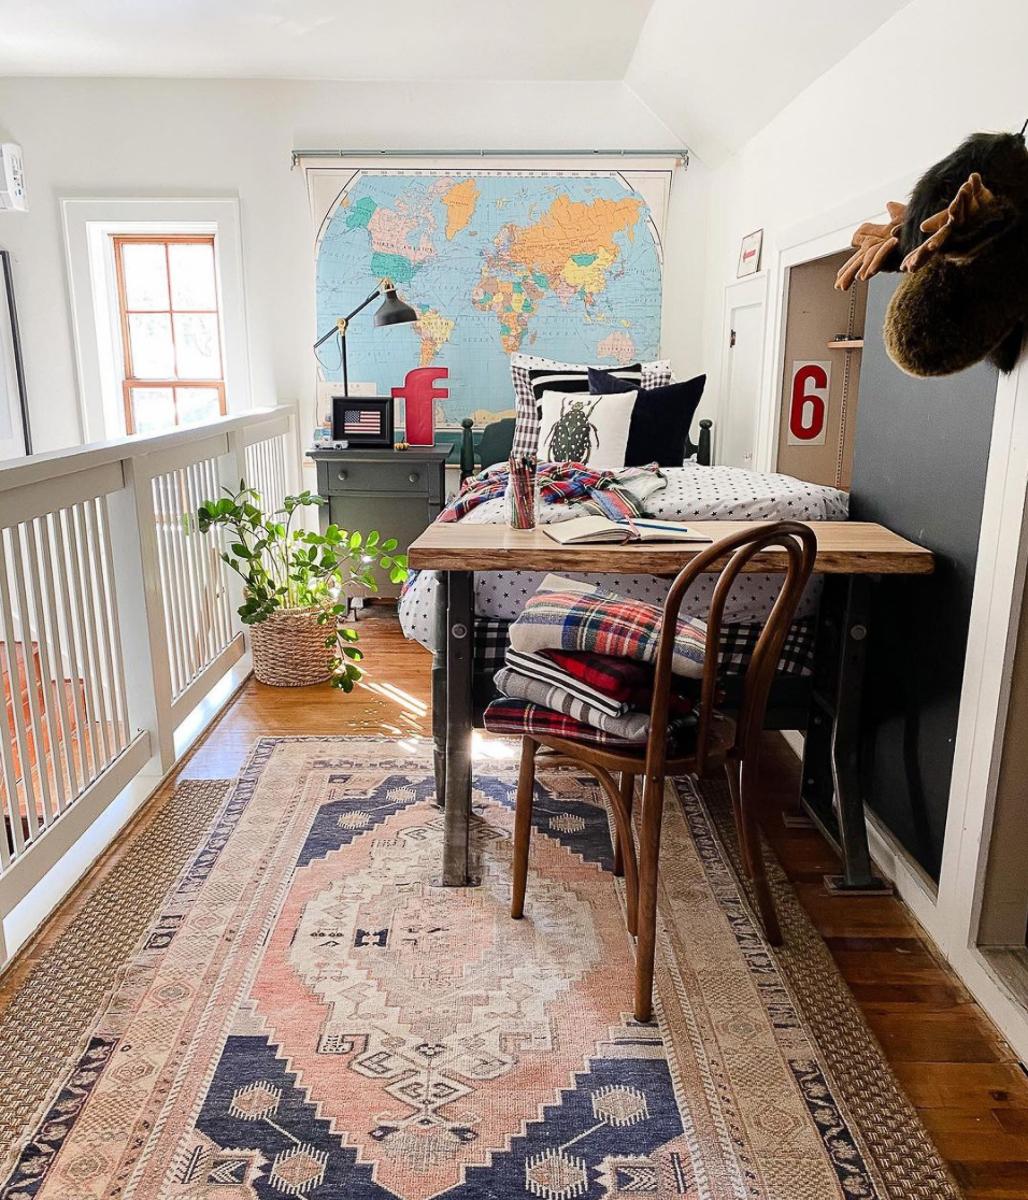 Cute vintage boys bedroom with pull down school map kellyelko.com